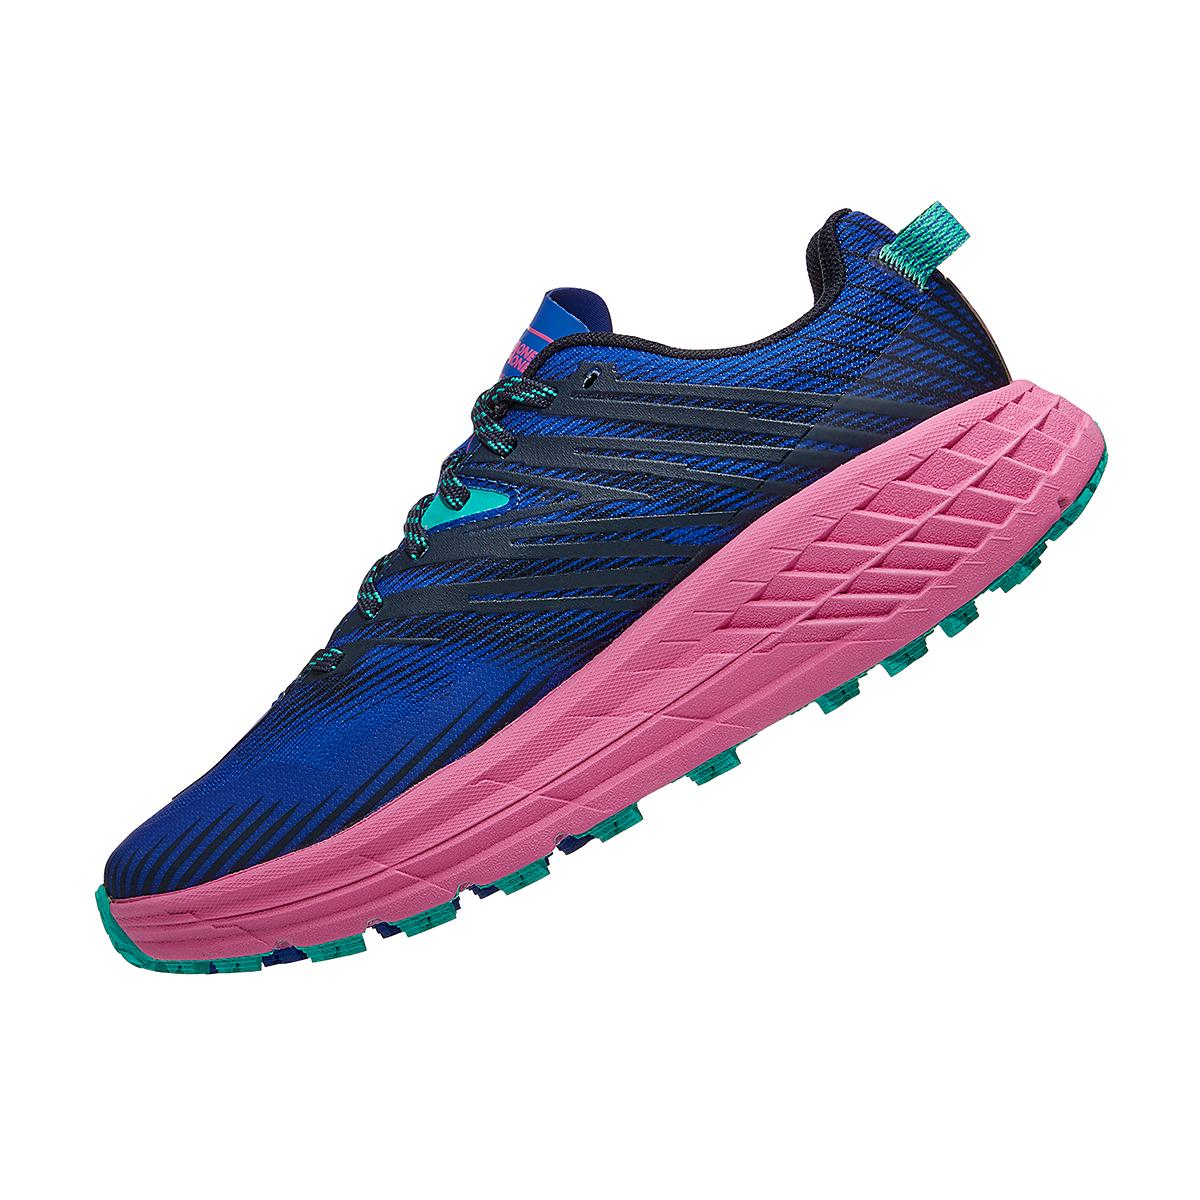 Women's Hoka One One Speedgoat 4 Trail Running Shoe - Color: Dazzling Blue/Phlox Pink - Size: 6 - Width: Regular, Dazzling Blue/Phlox Pink, large, image 3